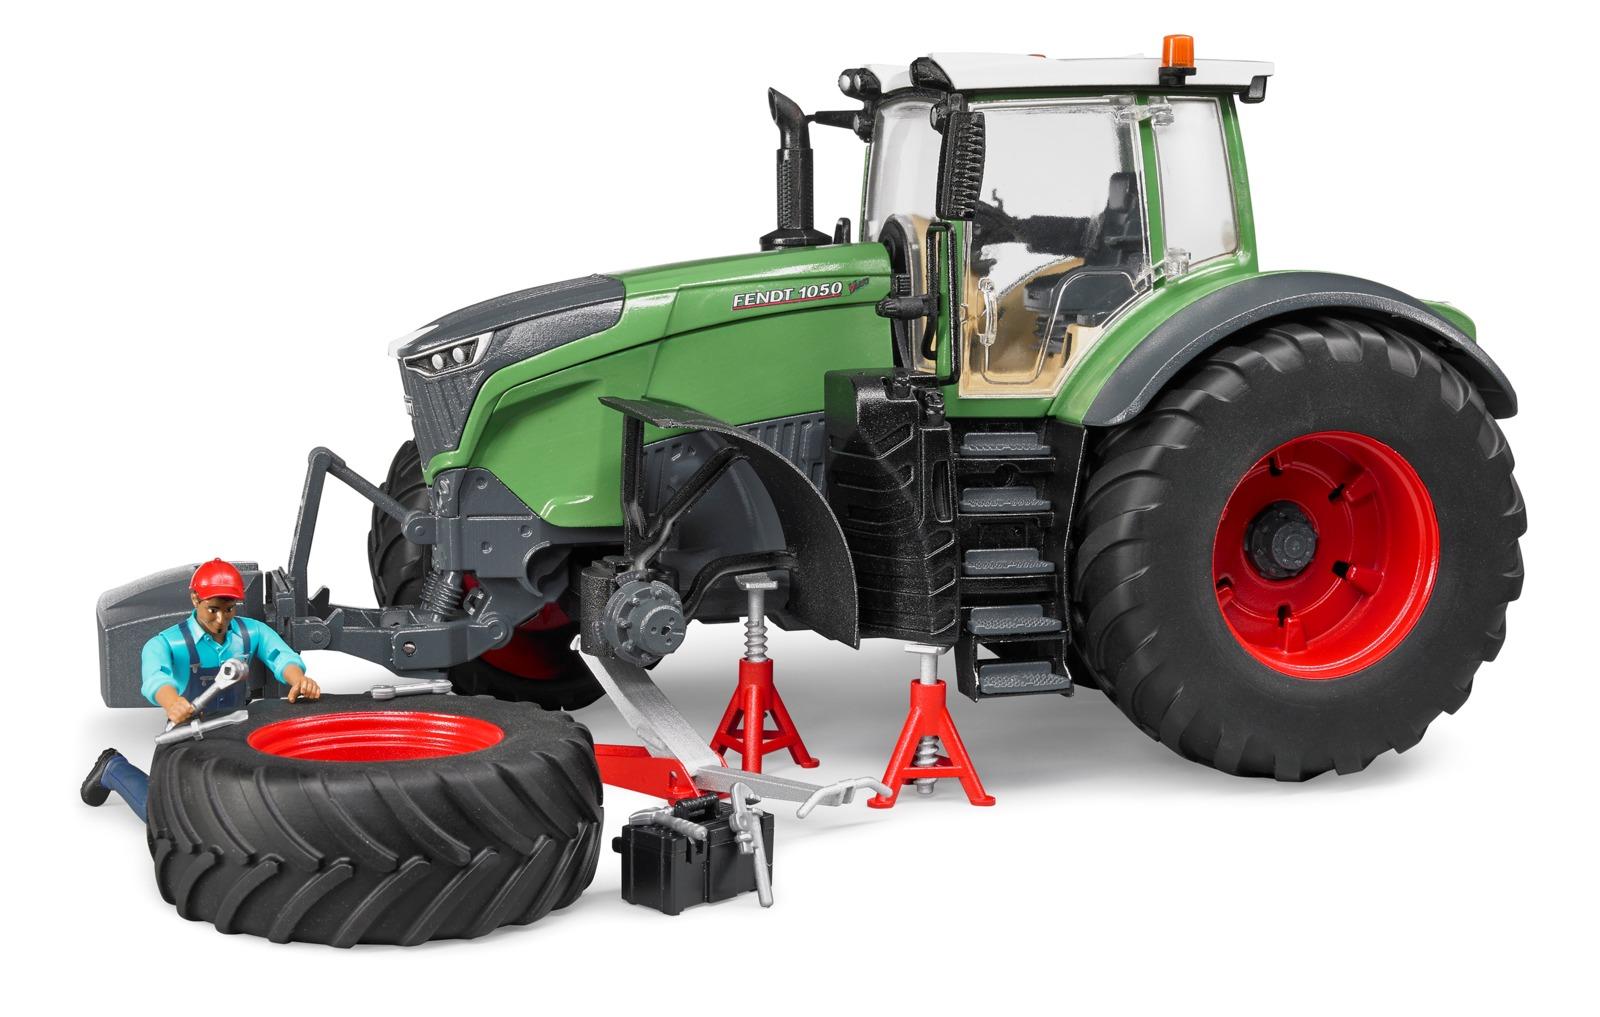 Bruder: Fendt 1050 Vario Tractor with Accessories image